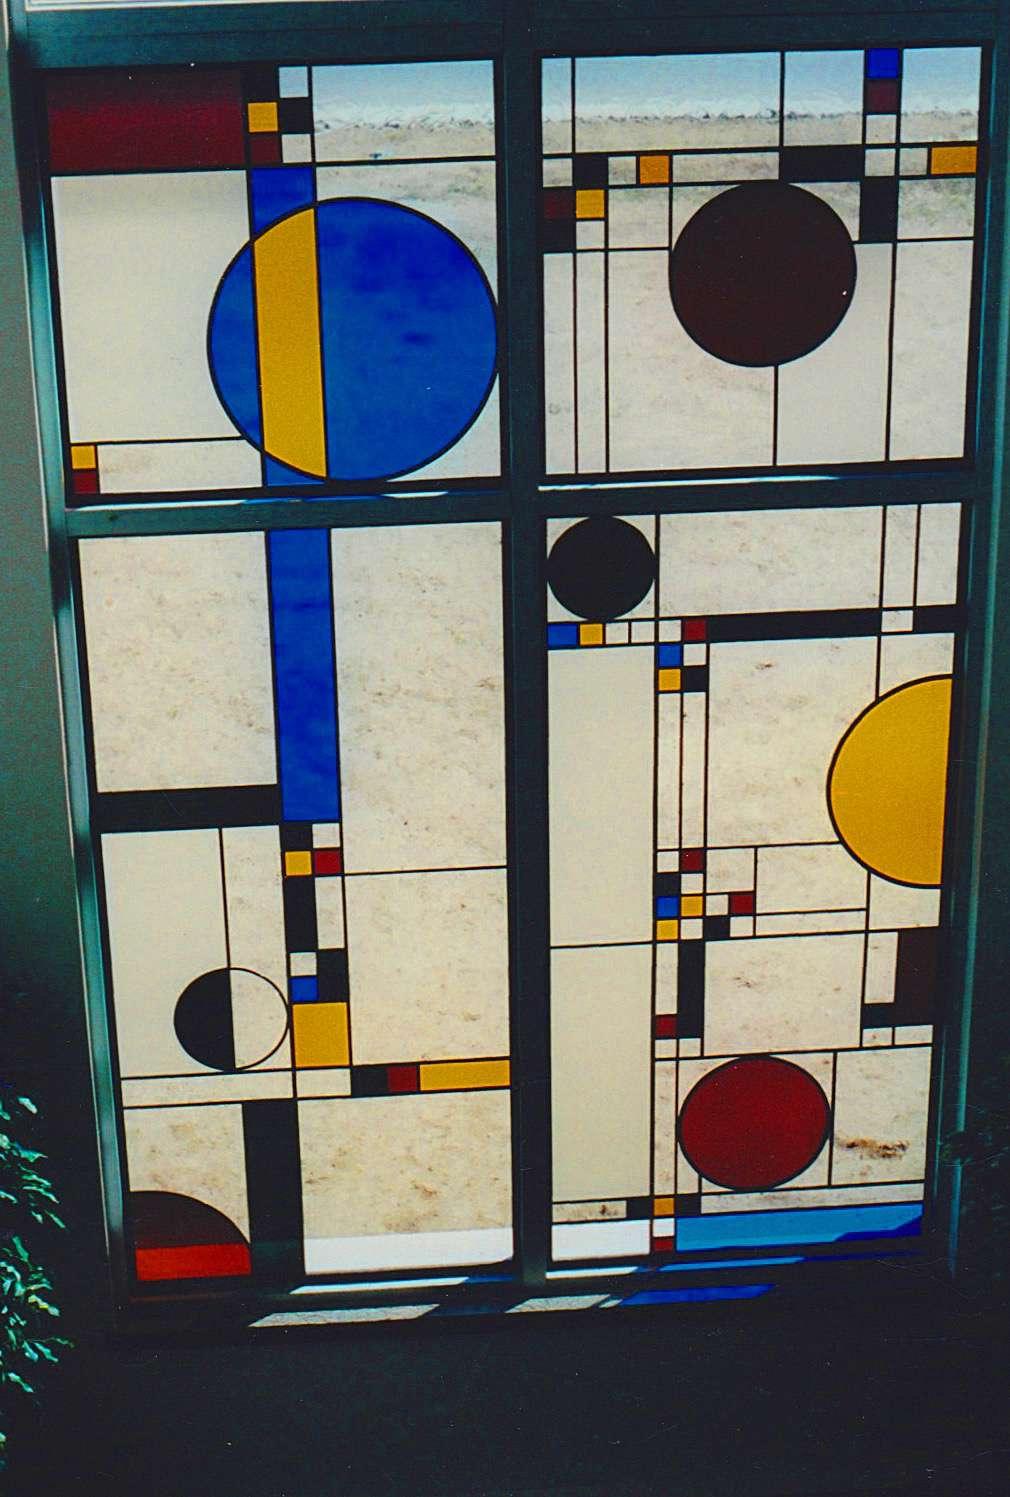 Courthouse window